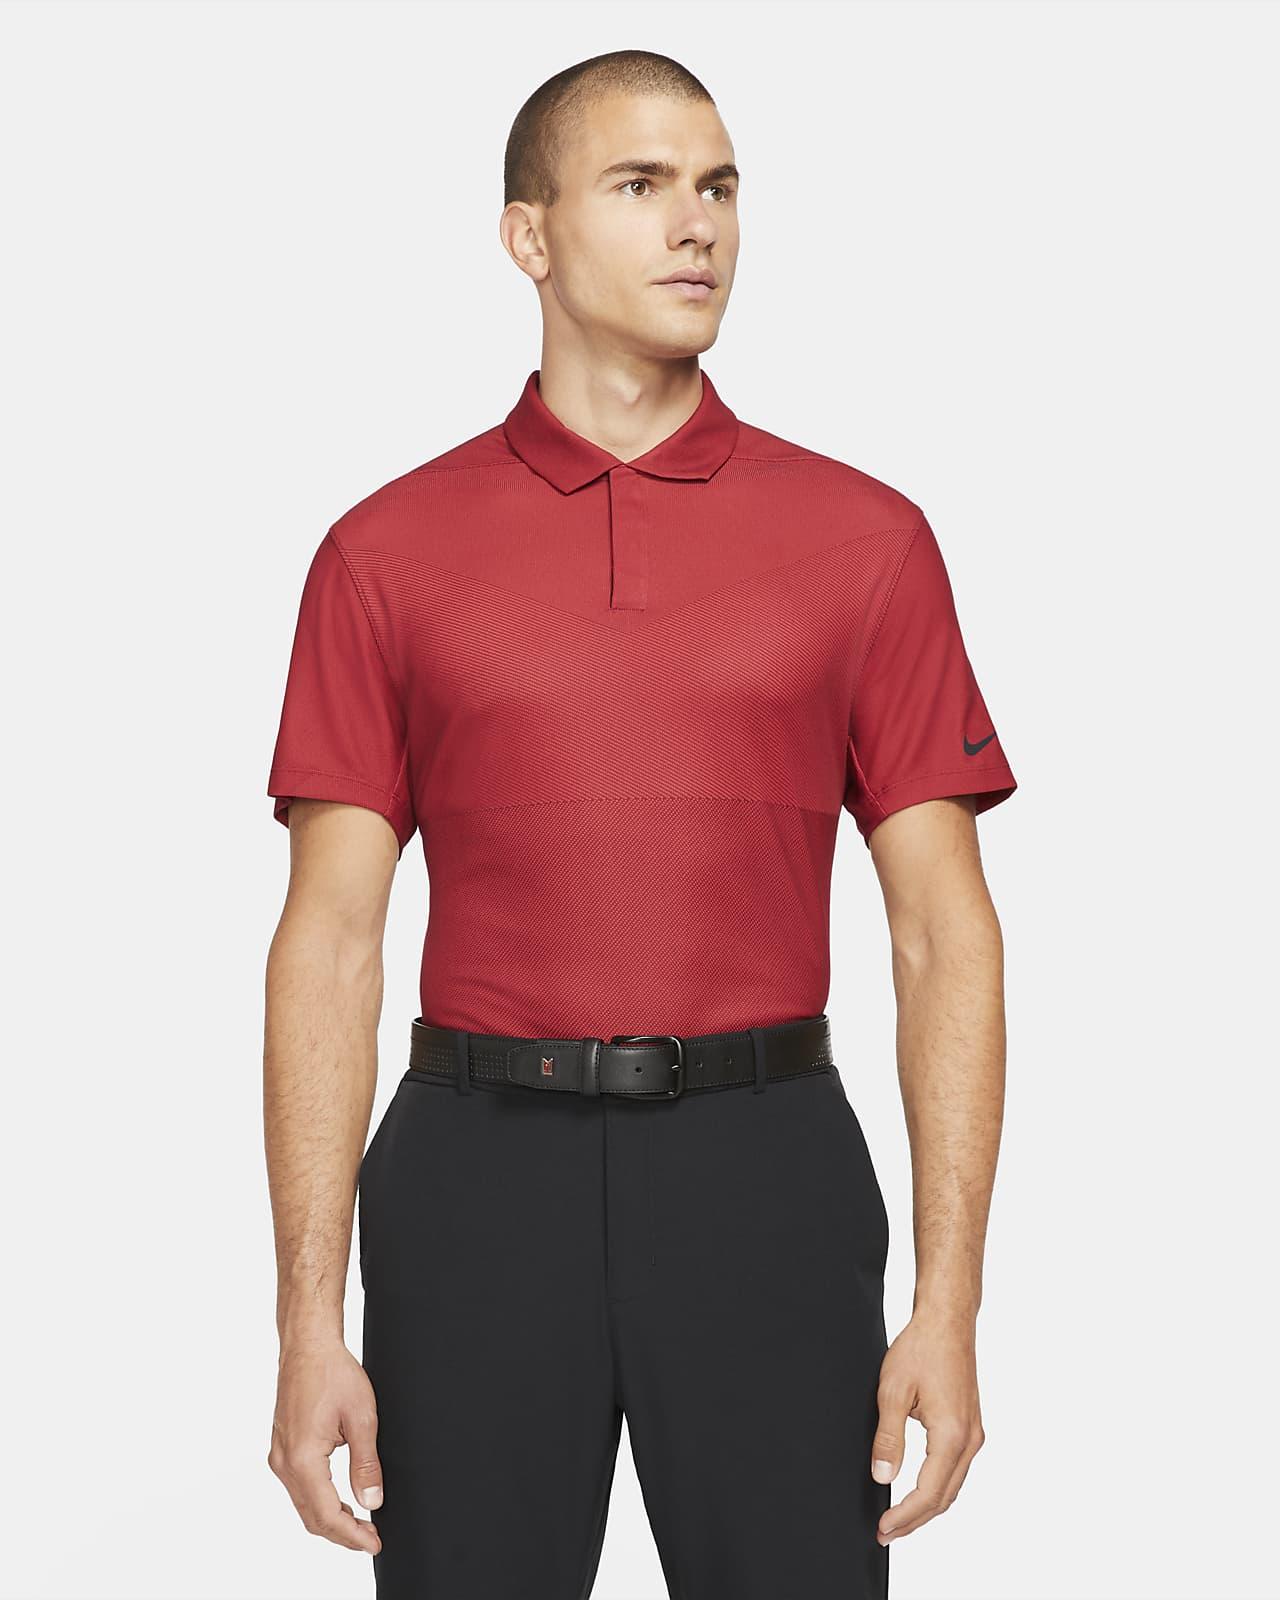 Polo de golf para hombre Nike Dri-FIT ADV Tiger Woods